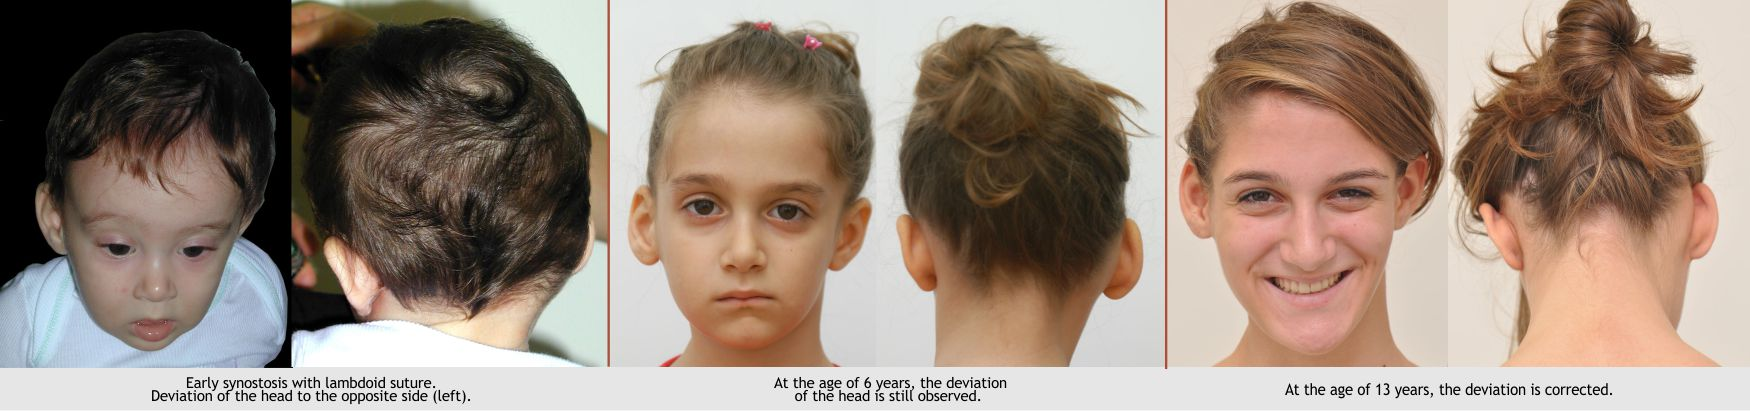 19-plagiocephaly-2